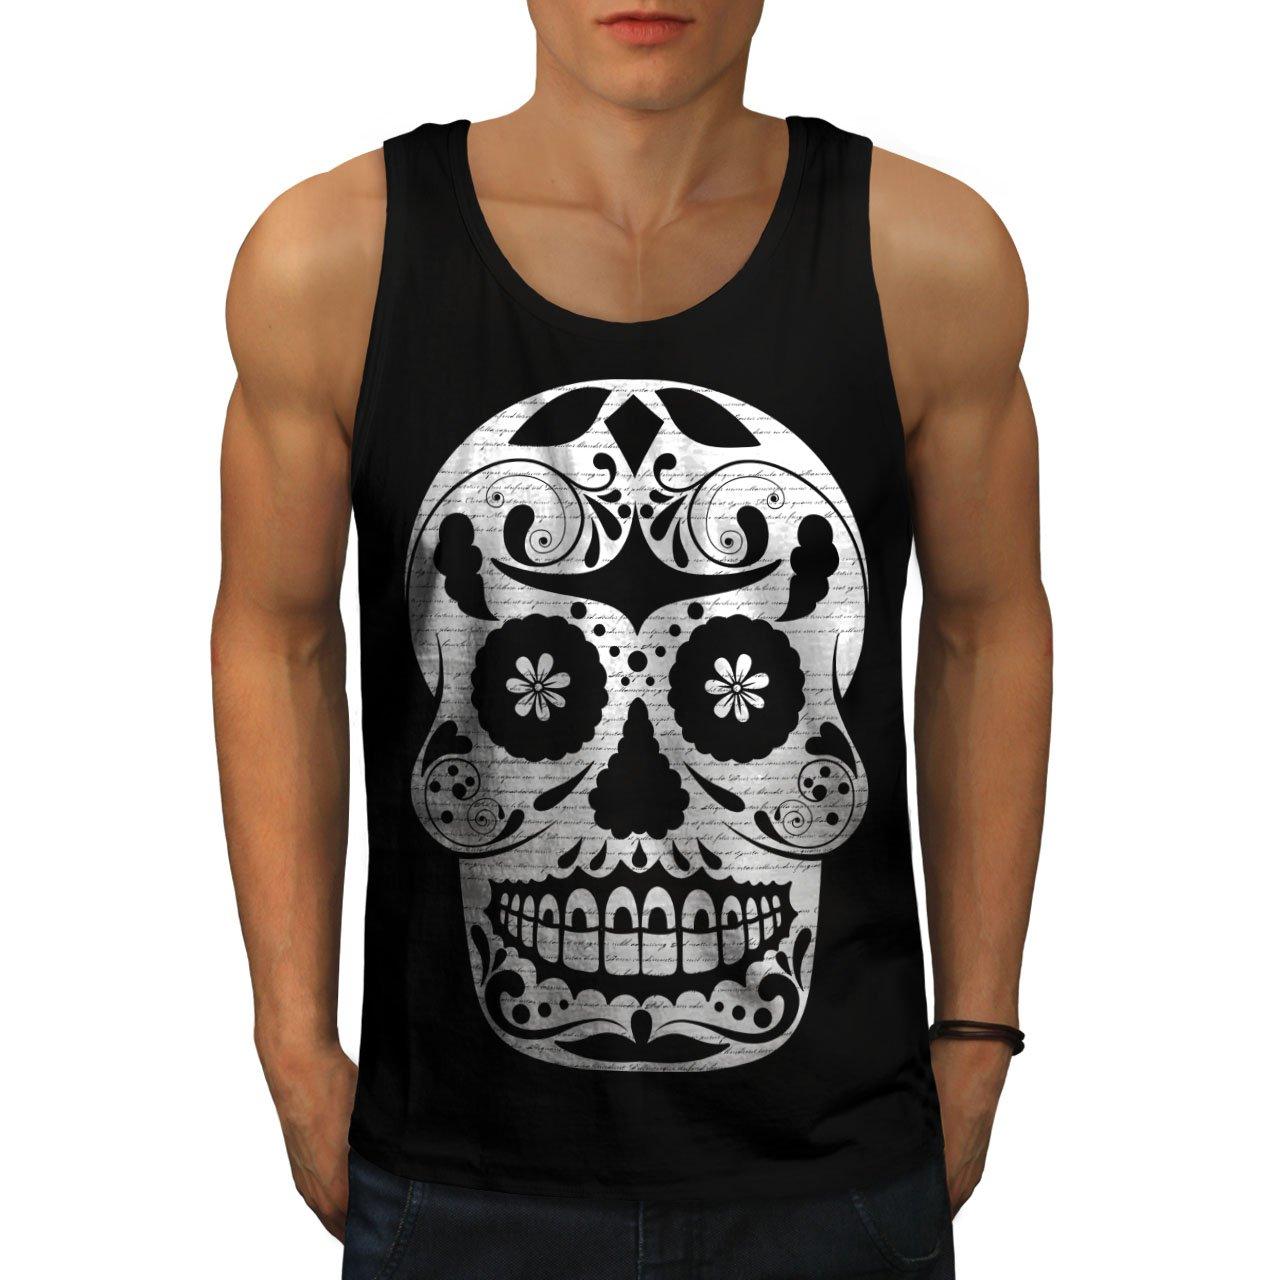 Wellcoda Amazing Aztec Skull Men Black M Tank Top